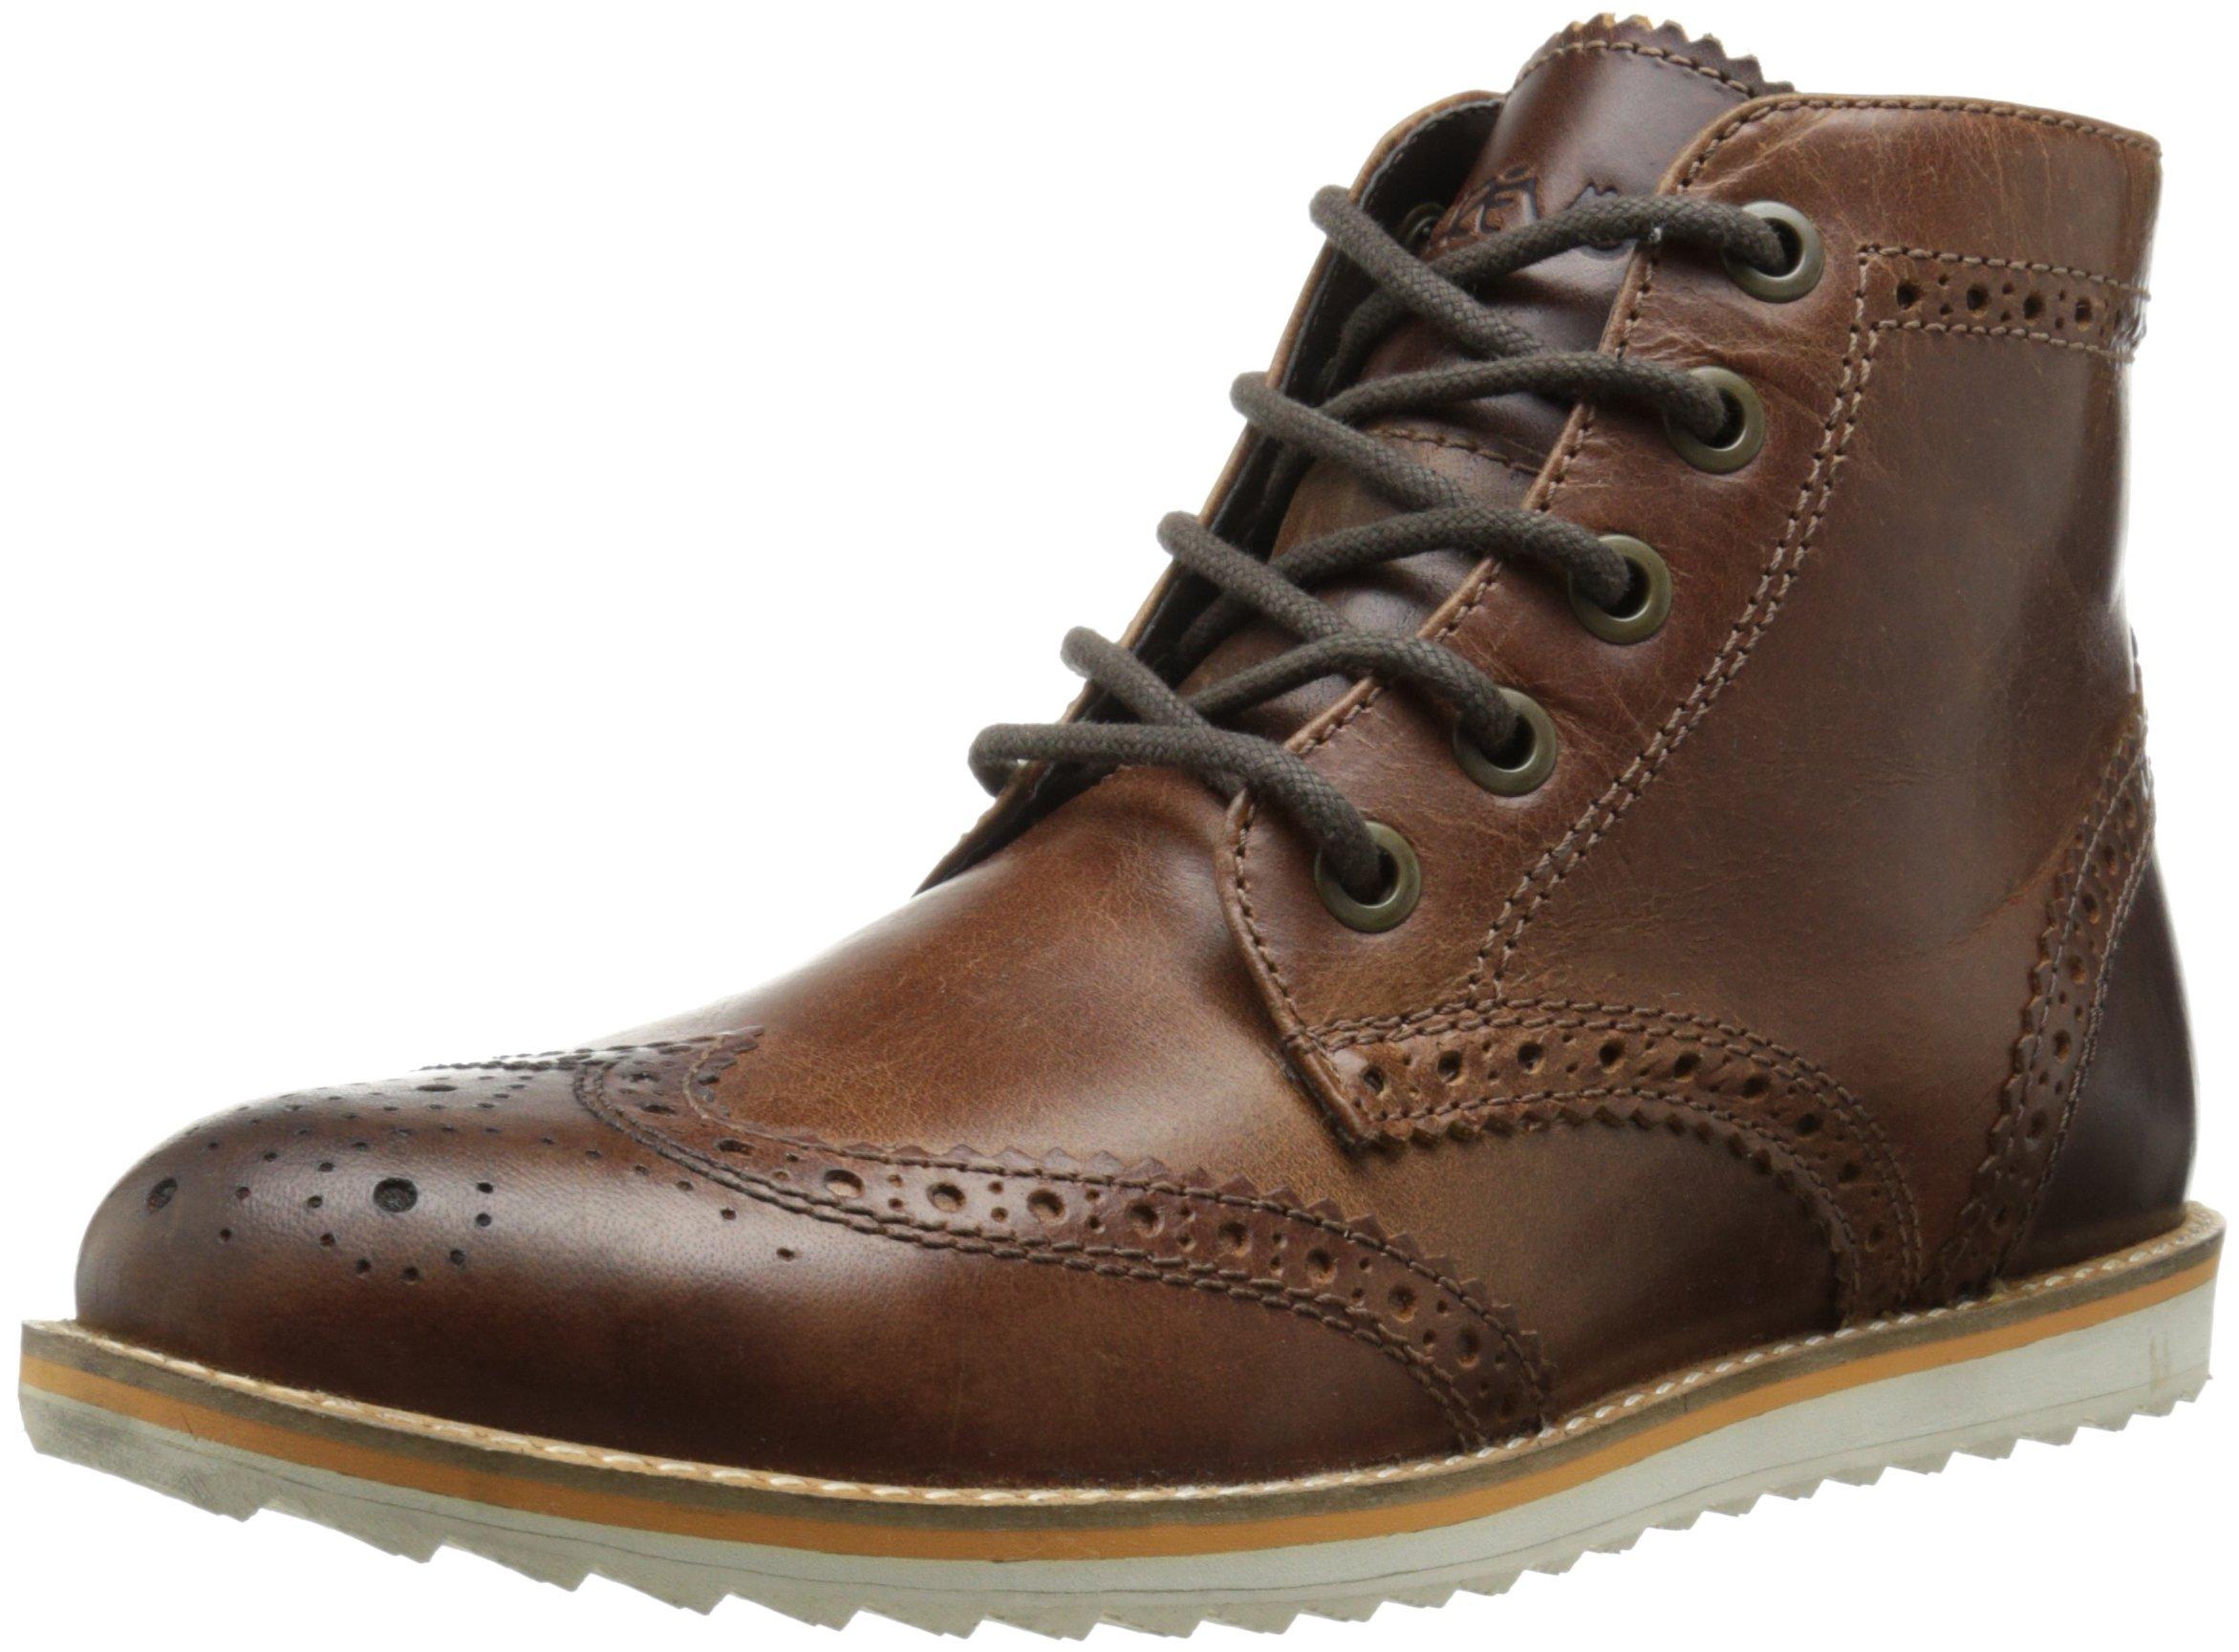 Crevo Men's Boardwalk Wing Tip Boot, Brown Leather, 11 M US by Crevo